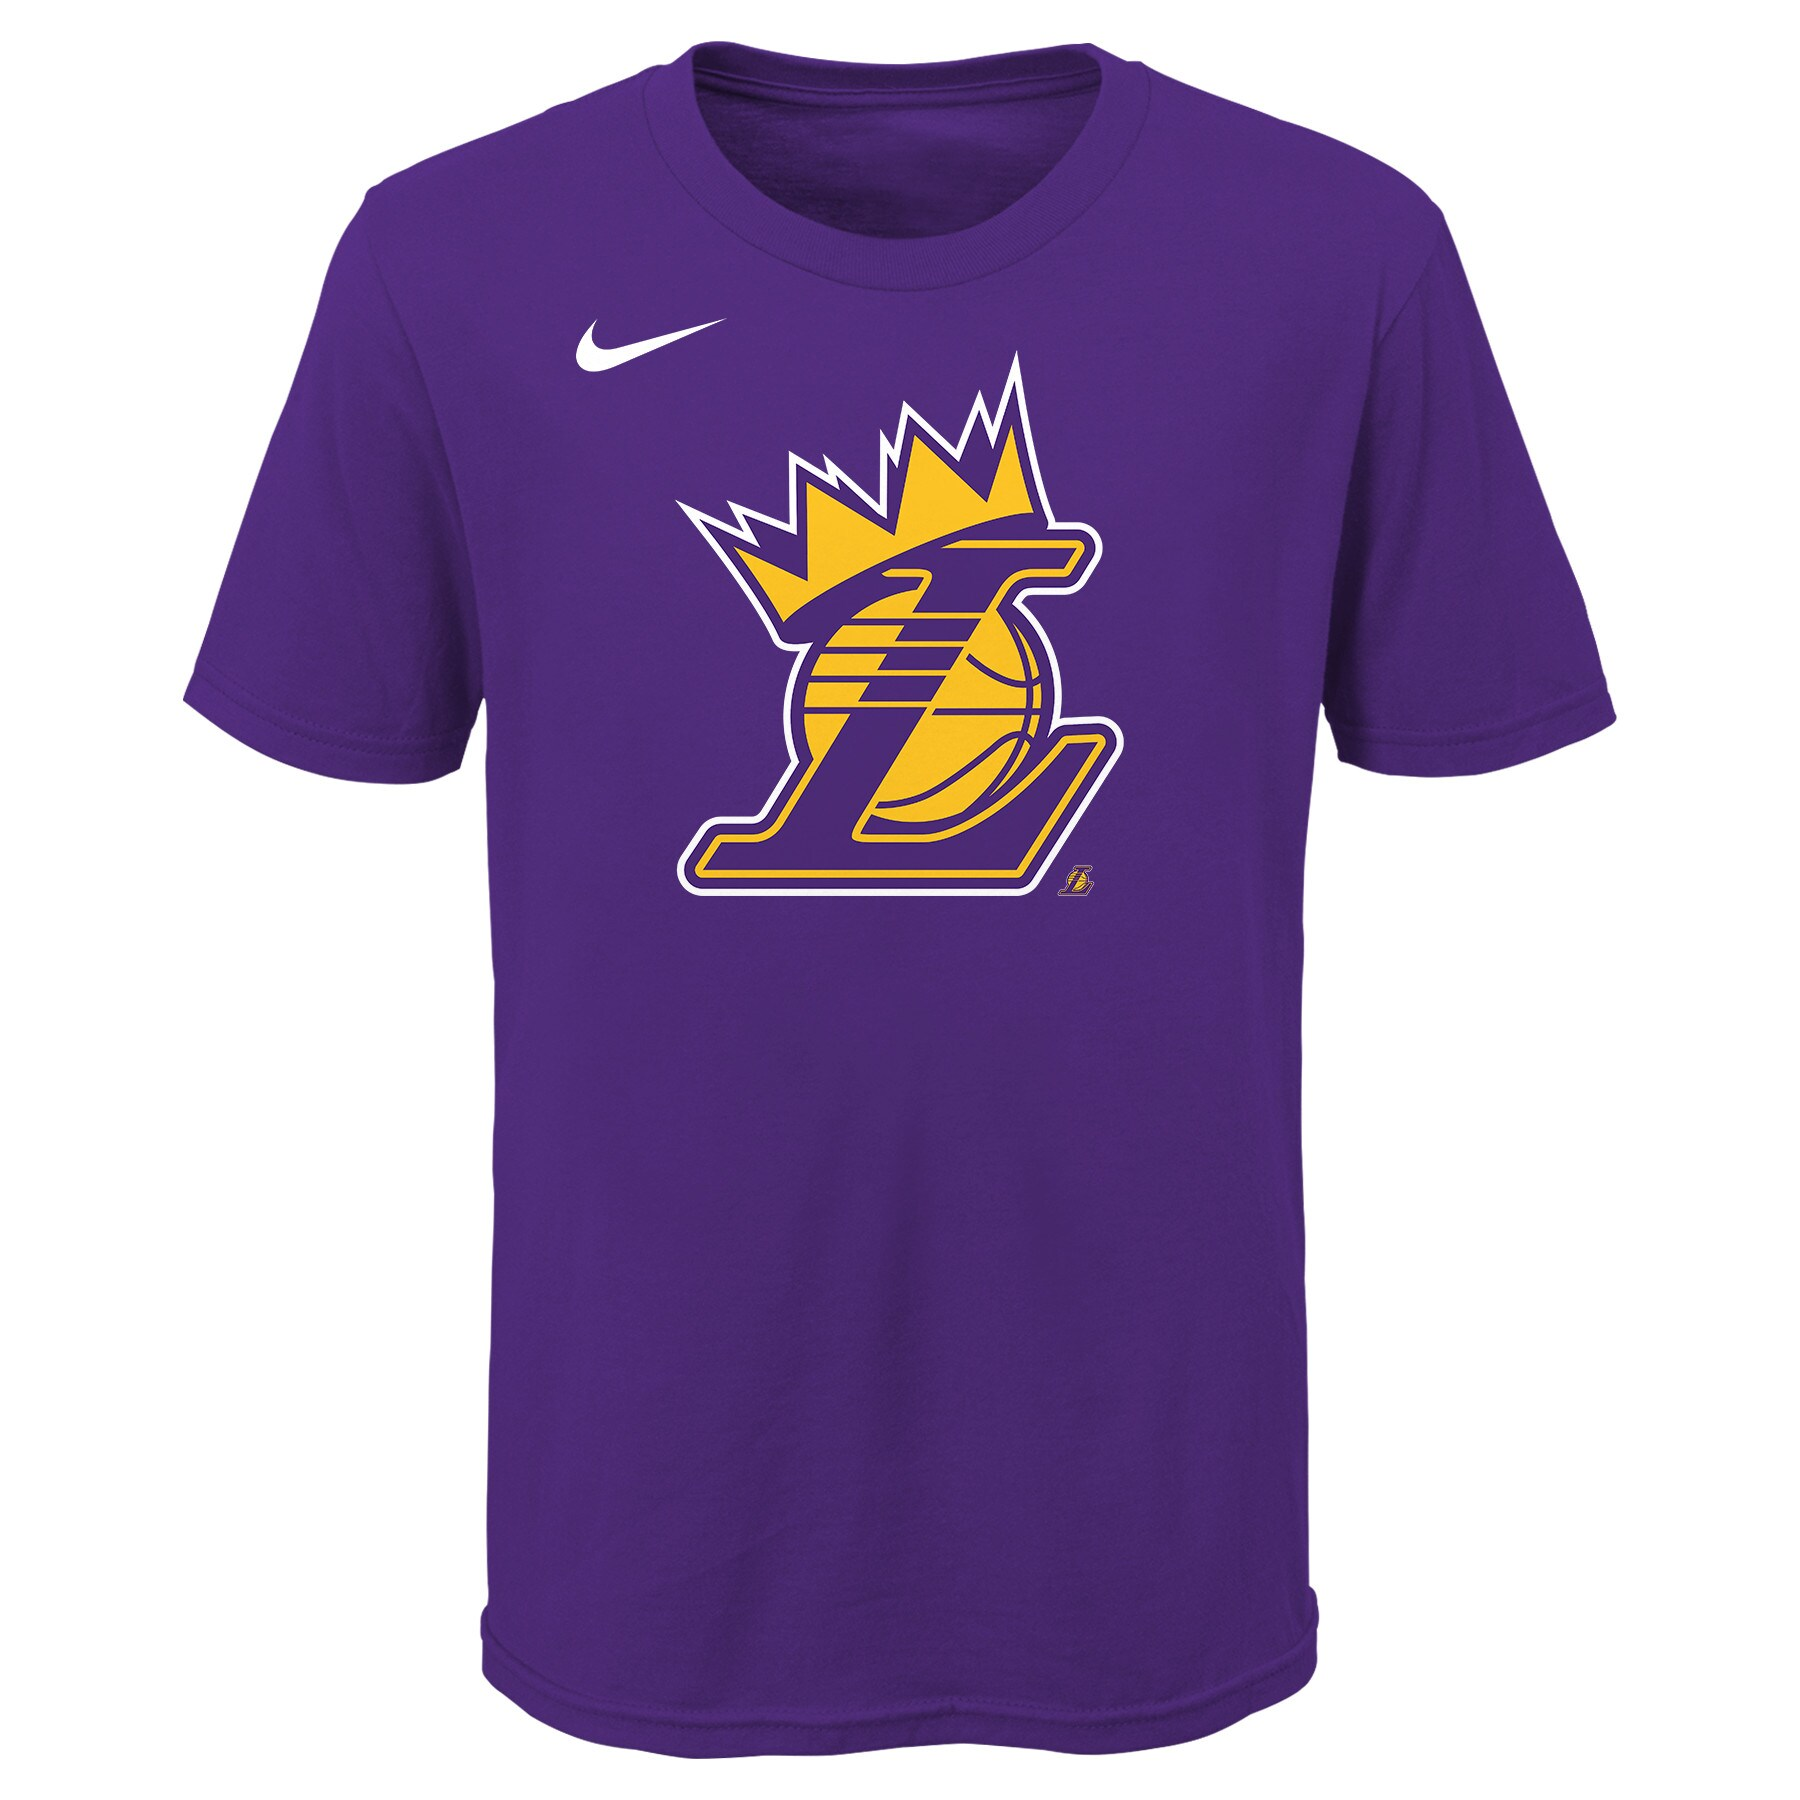 Nike - Los Angeles Lakers Nike Youth Lakers Crown T-Shirt - Purple ...